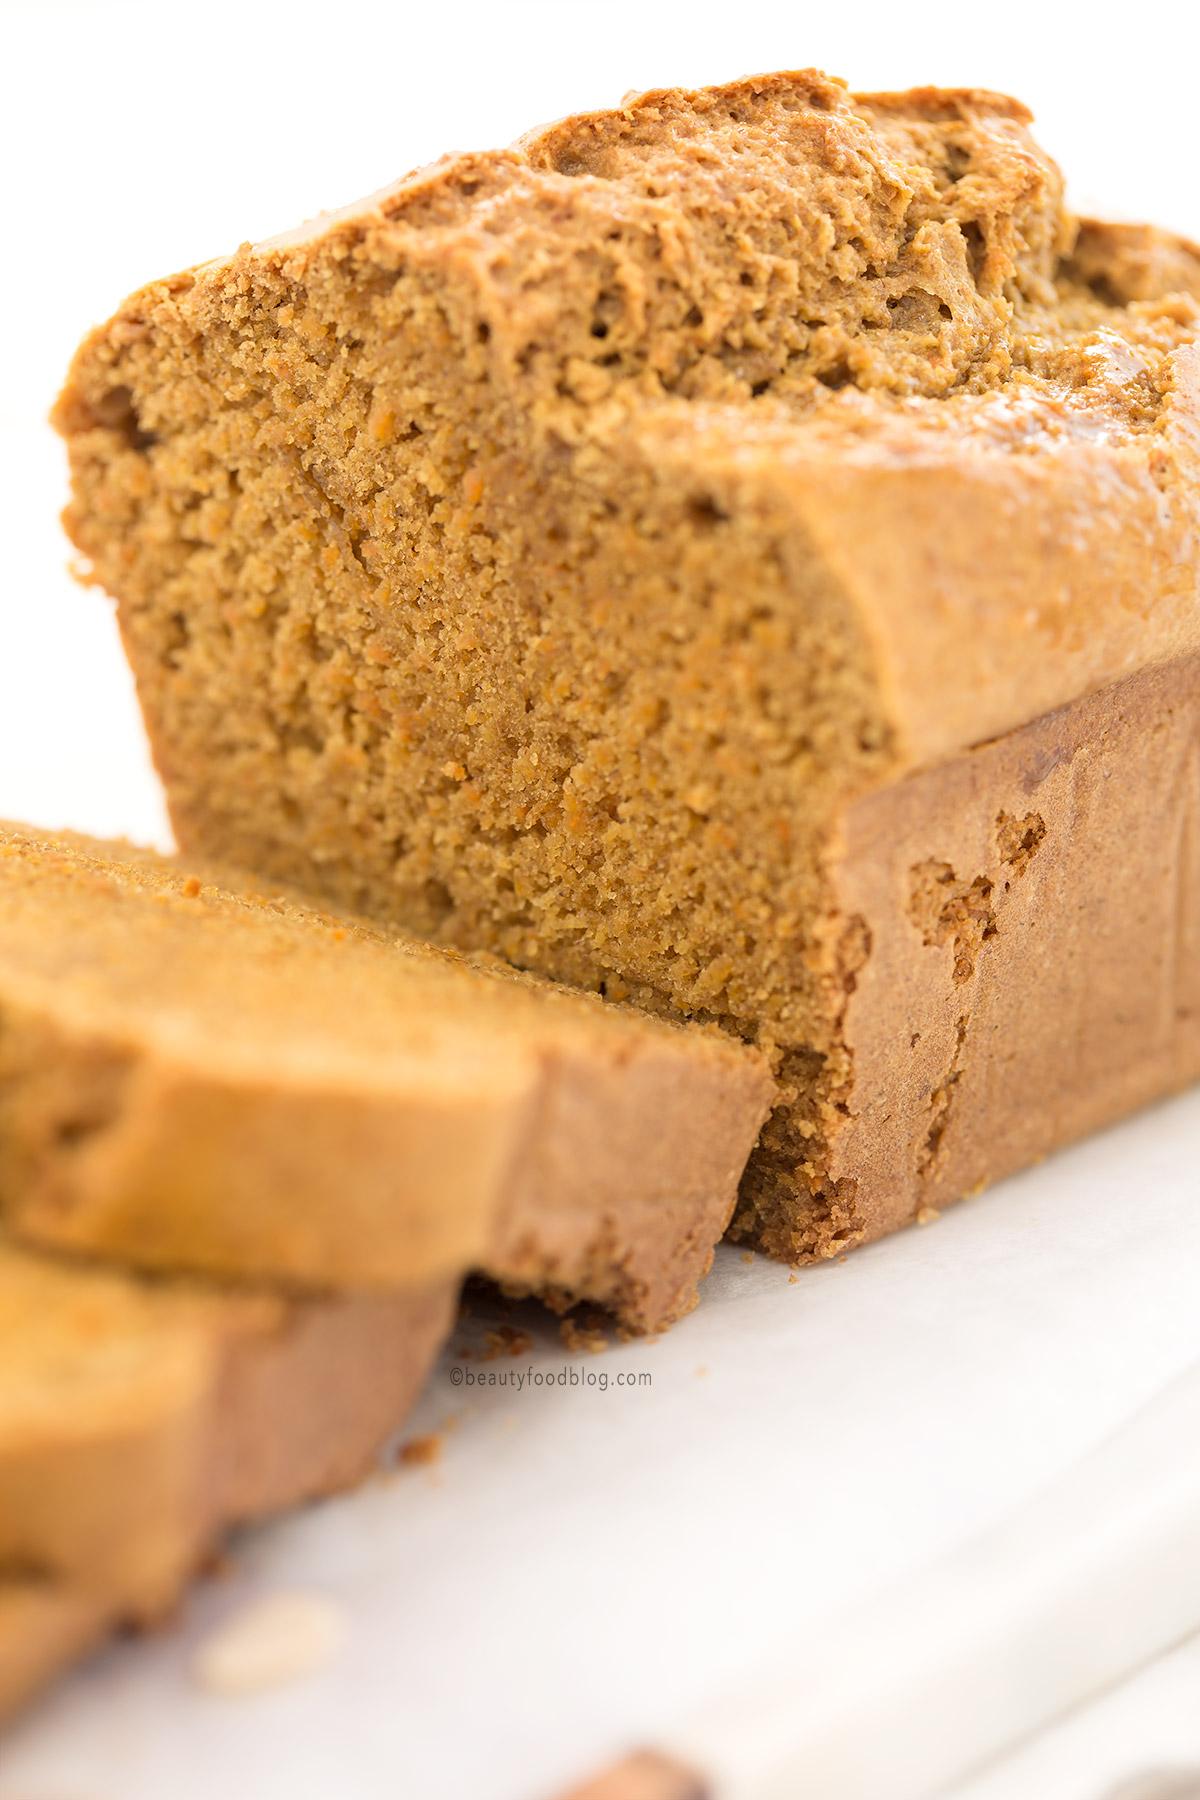 wholemeal spelt vegan carrot almond loaf cake - plumcake vegan alle carote e mandorle di farro integrale